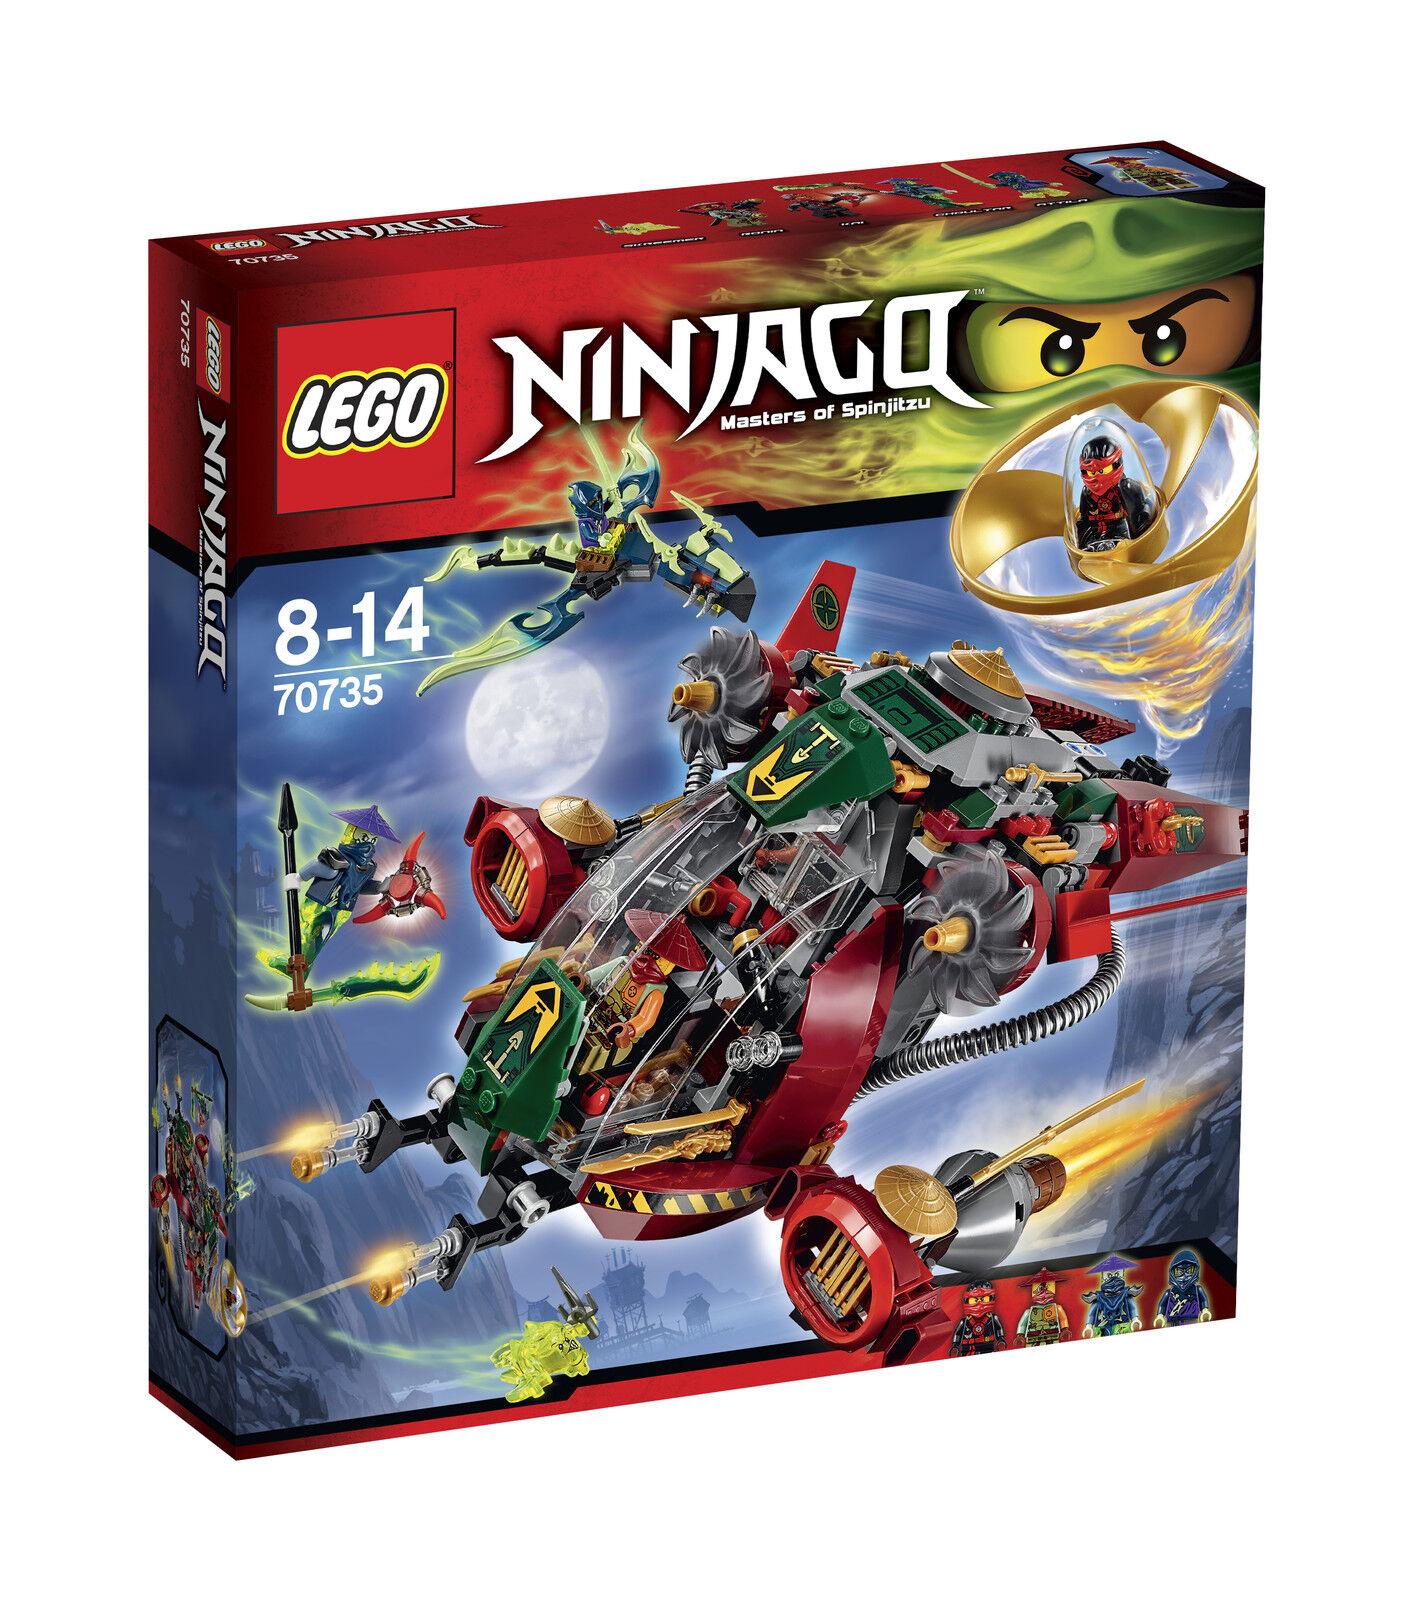 LEGO ® Ninjago ™ ™ ™ 70735 ronin r.e.x. nouveau OVP New MISB NRFB 609e21